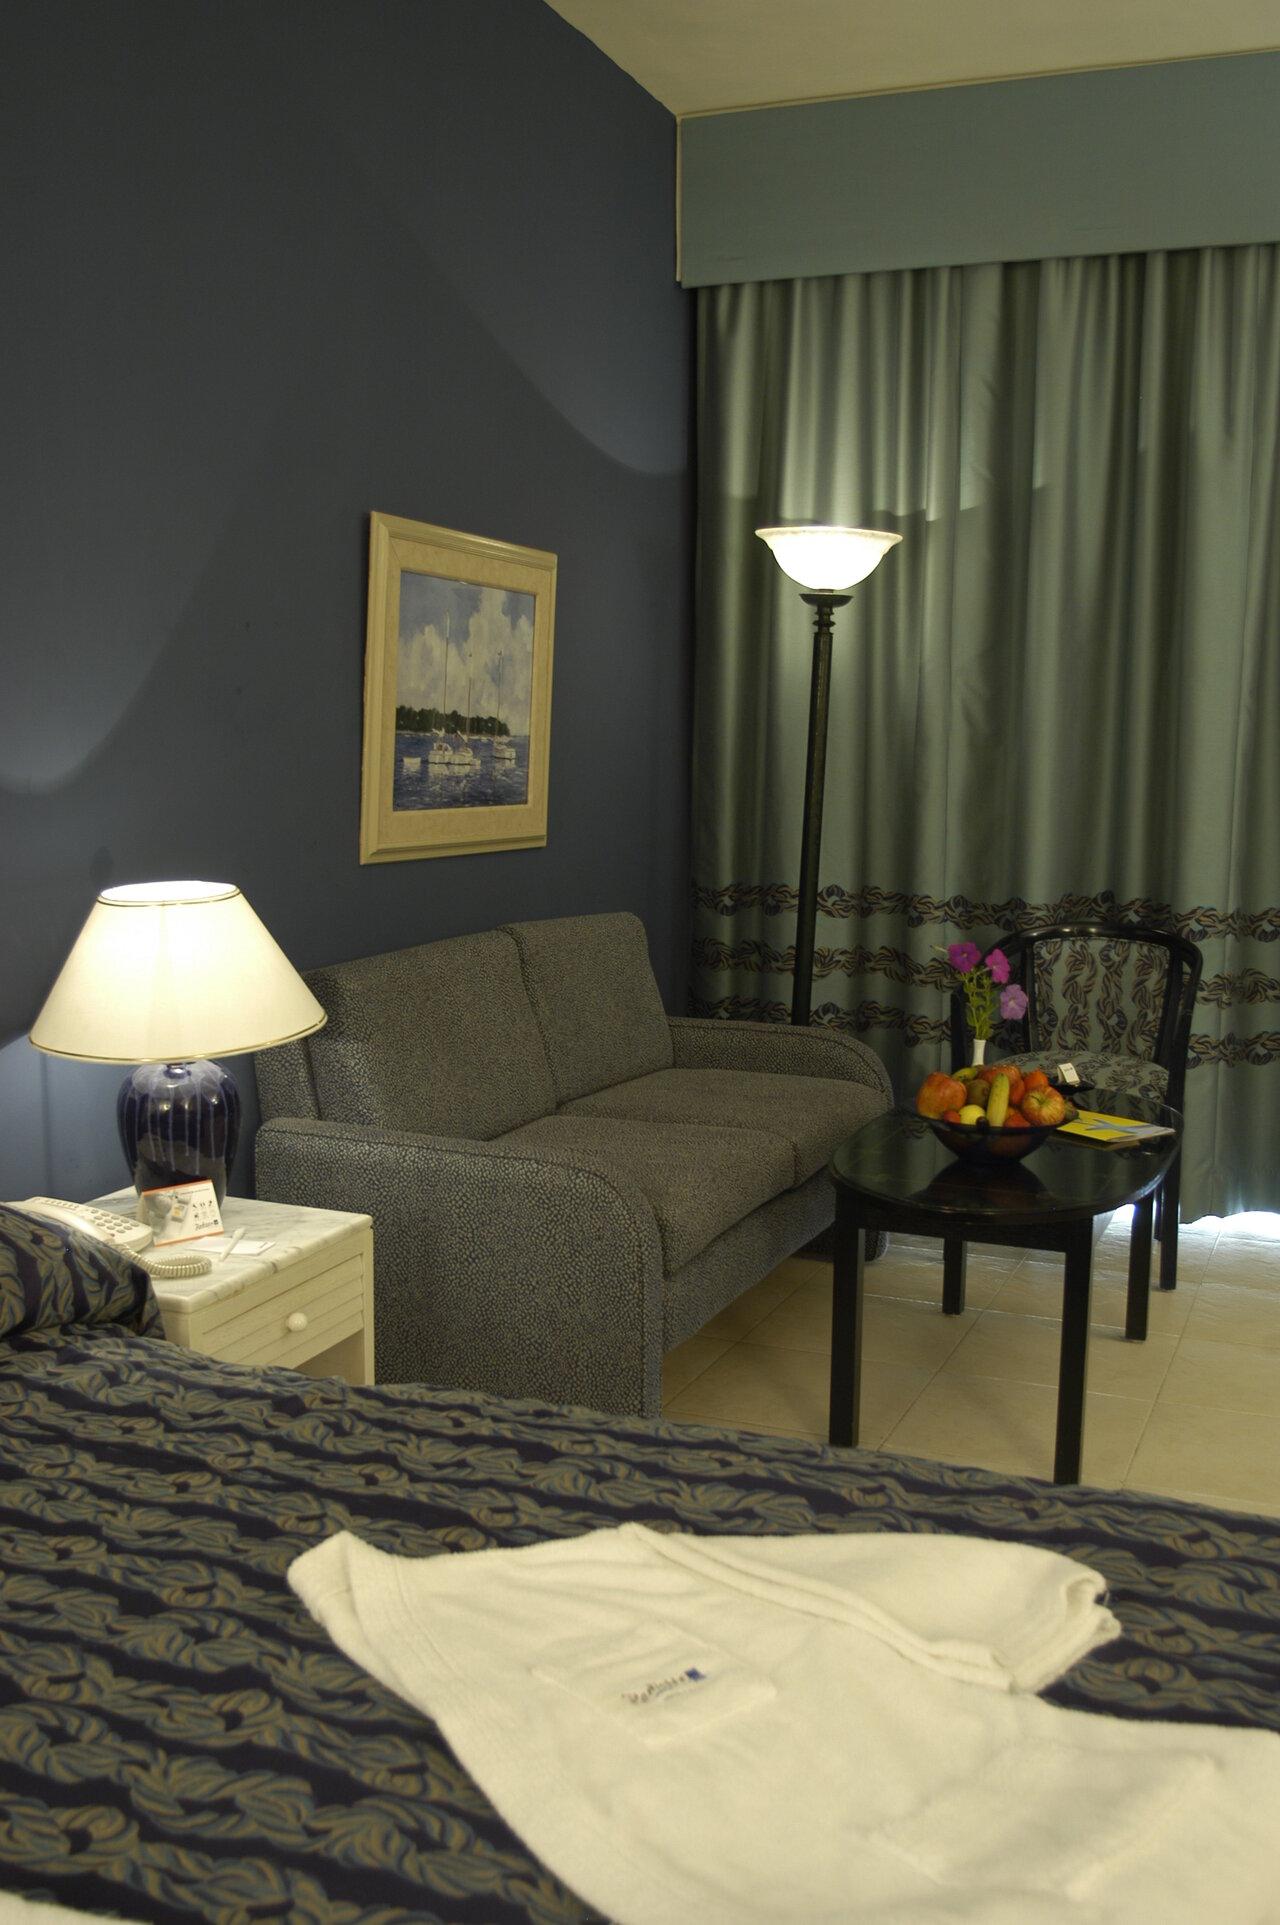 Parotel Beach Hotel